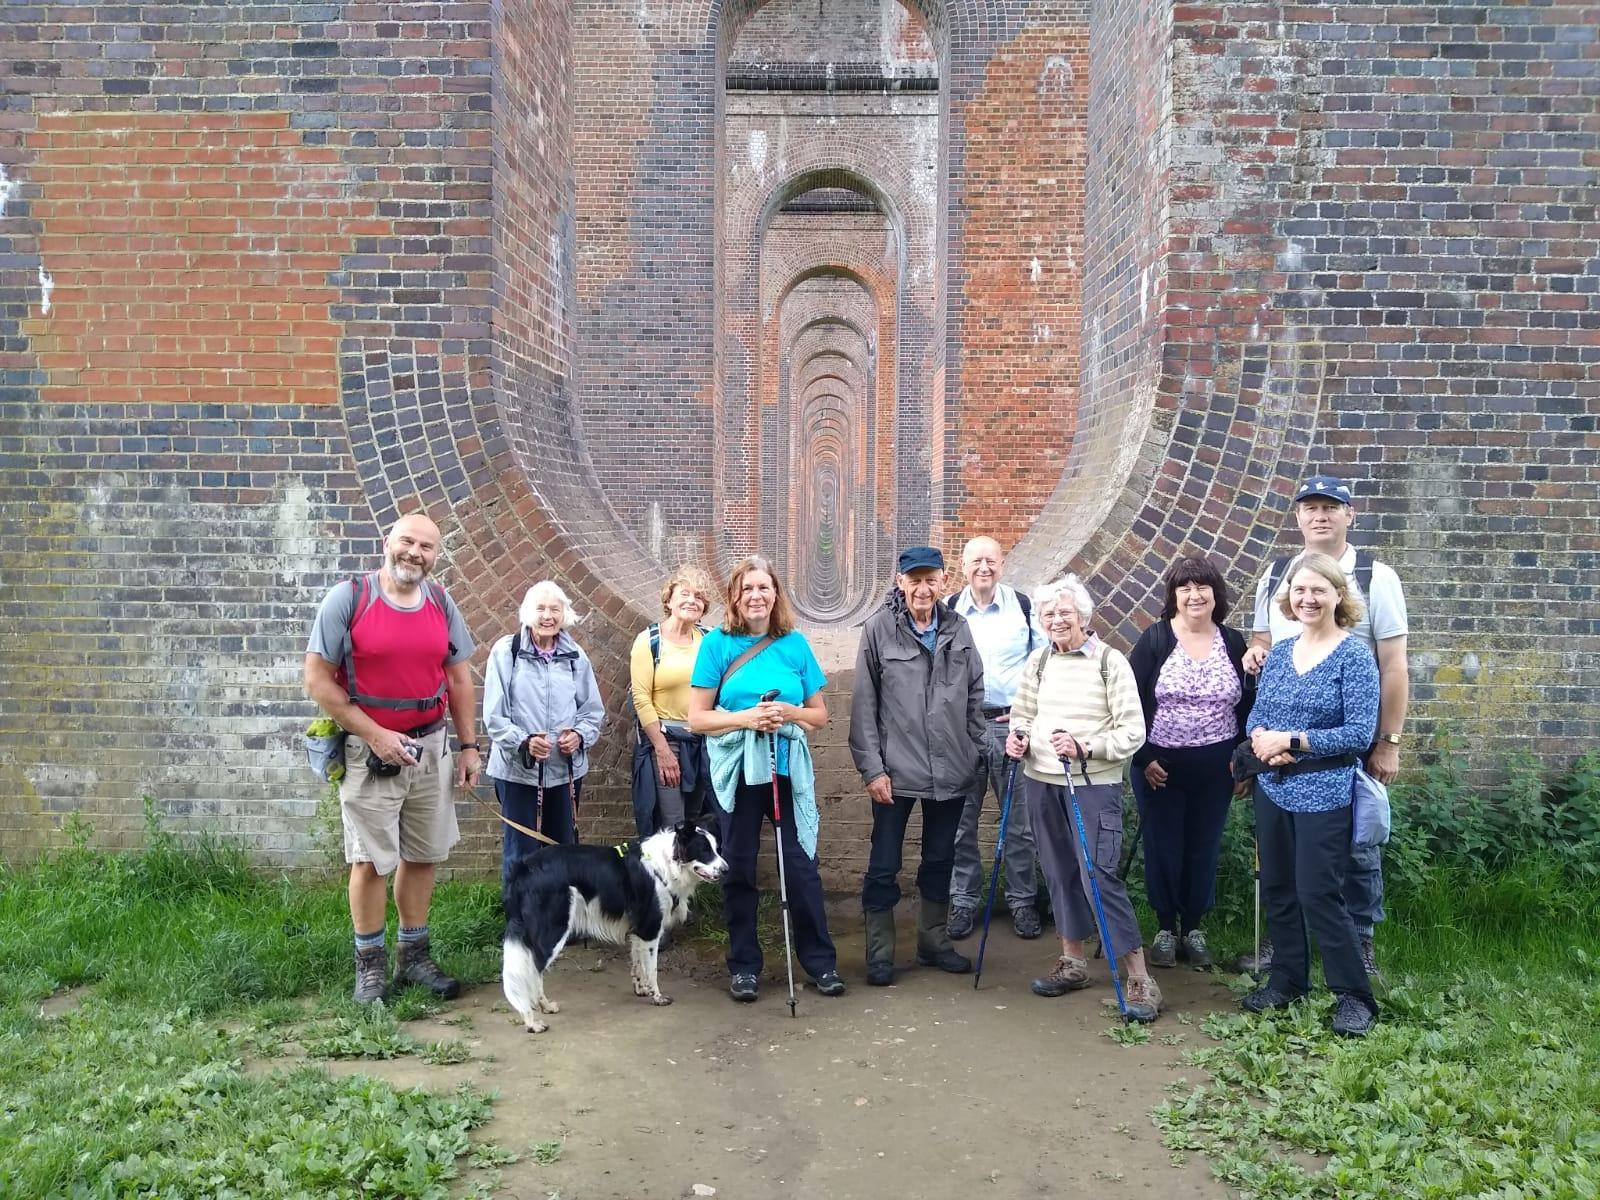 Glynde to Lewes self guided walk